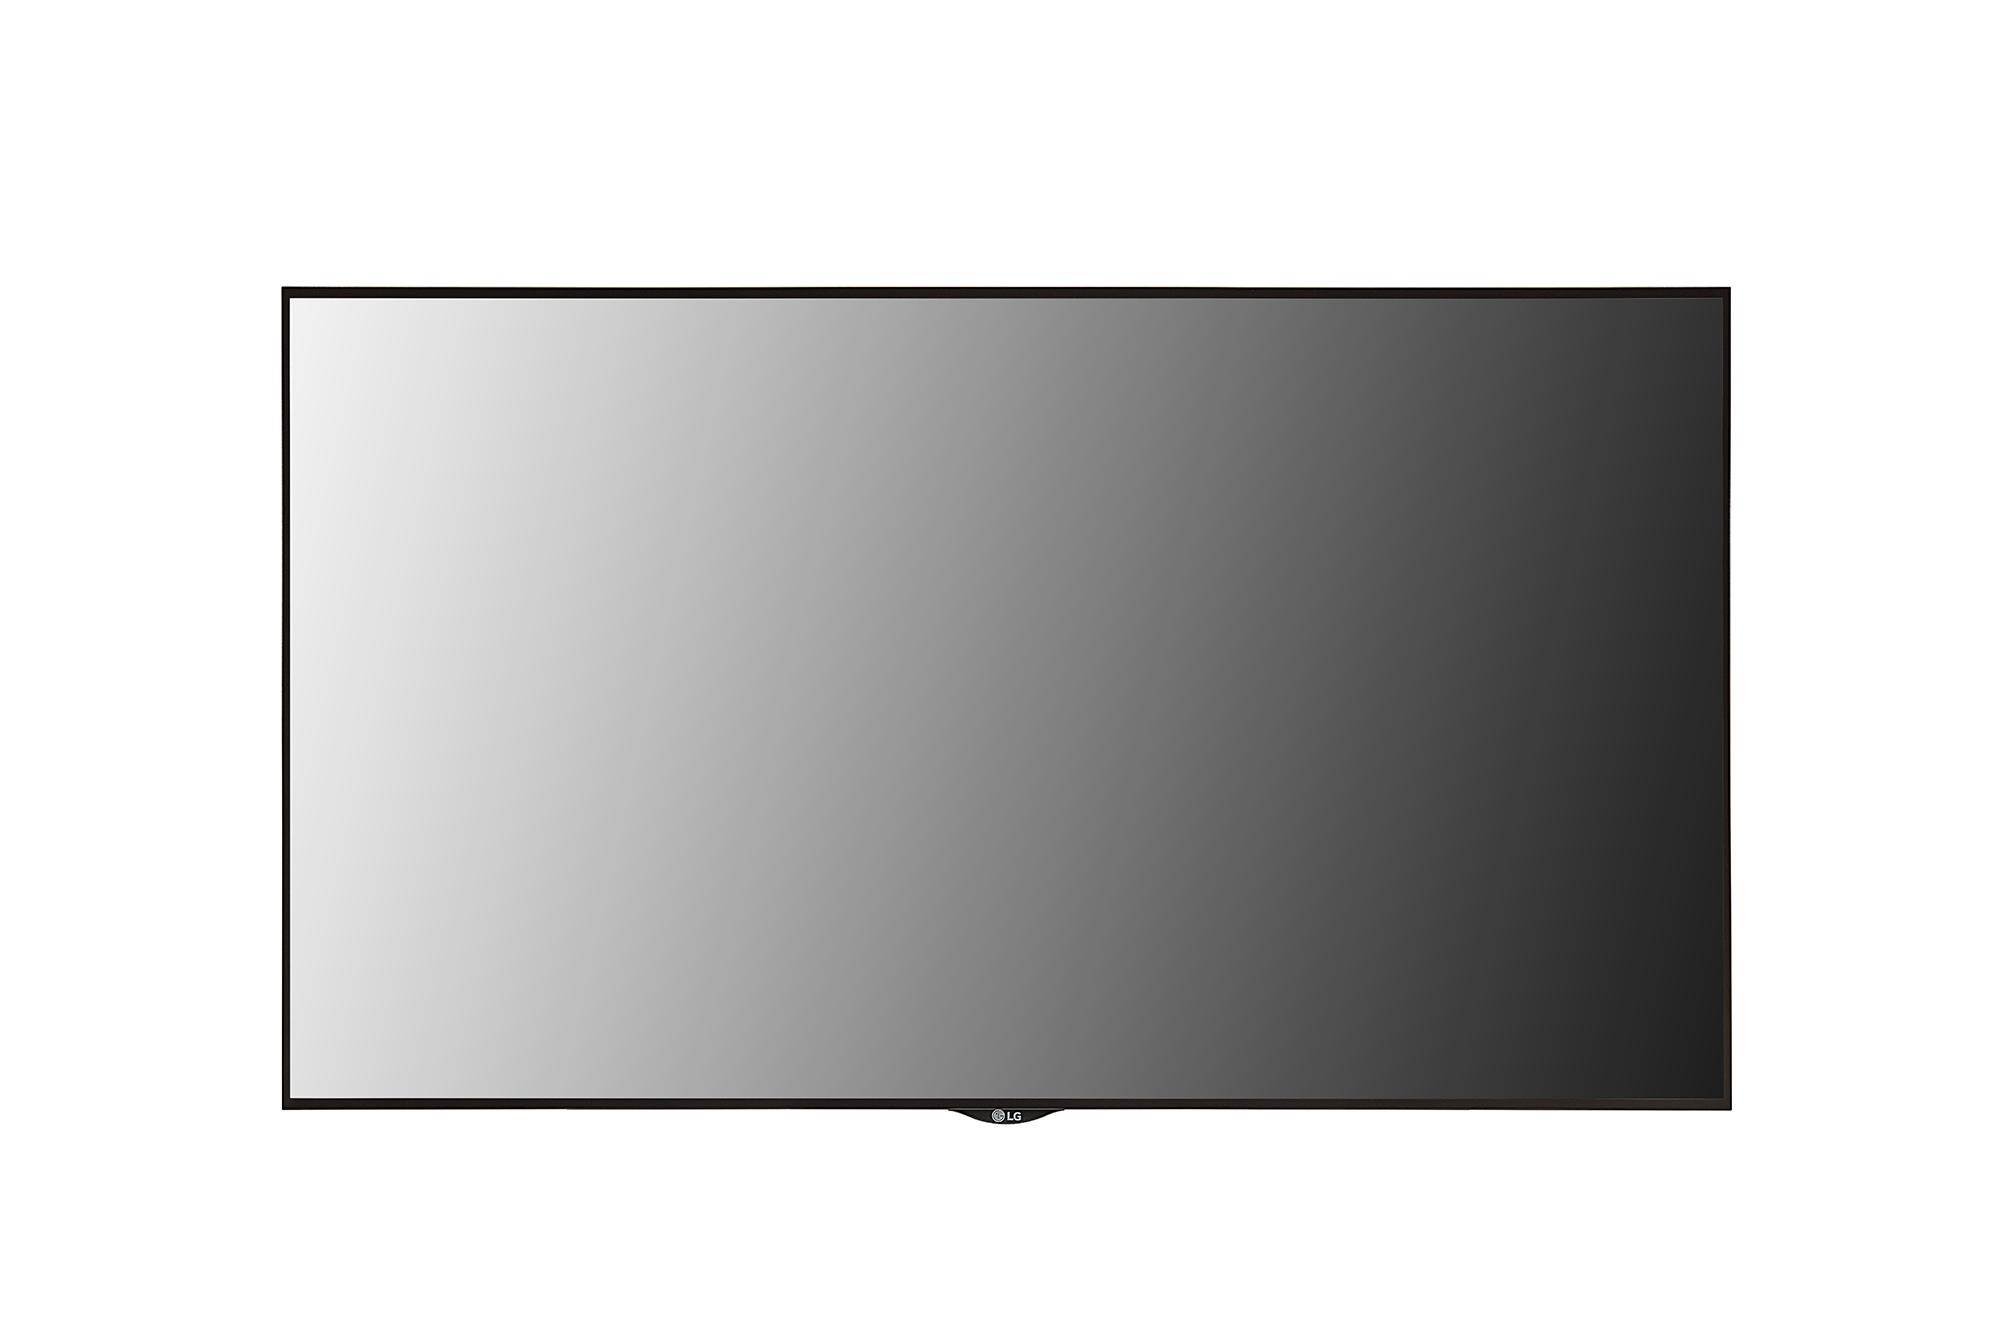 Digital Signage 55XS4J-B, Front view